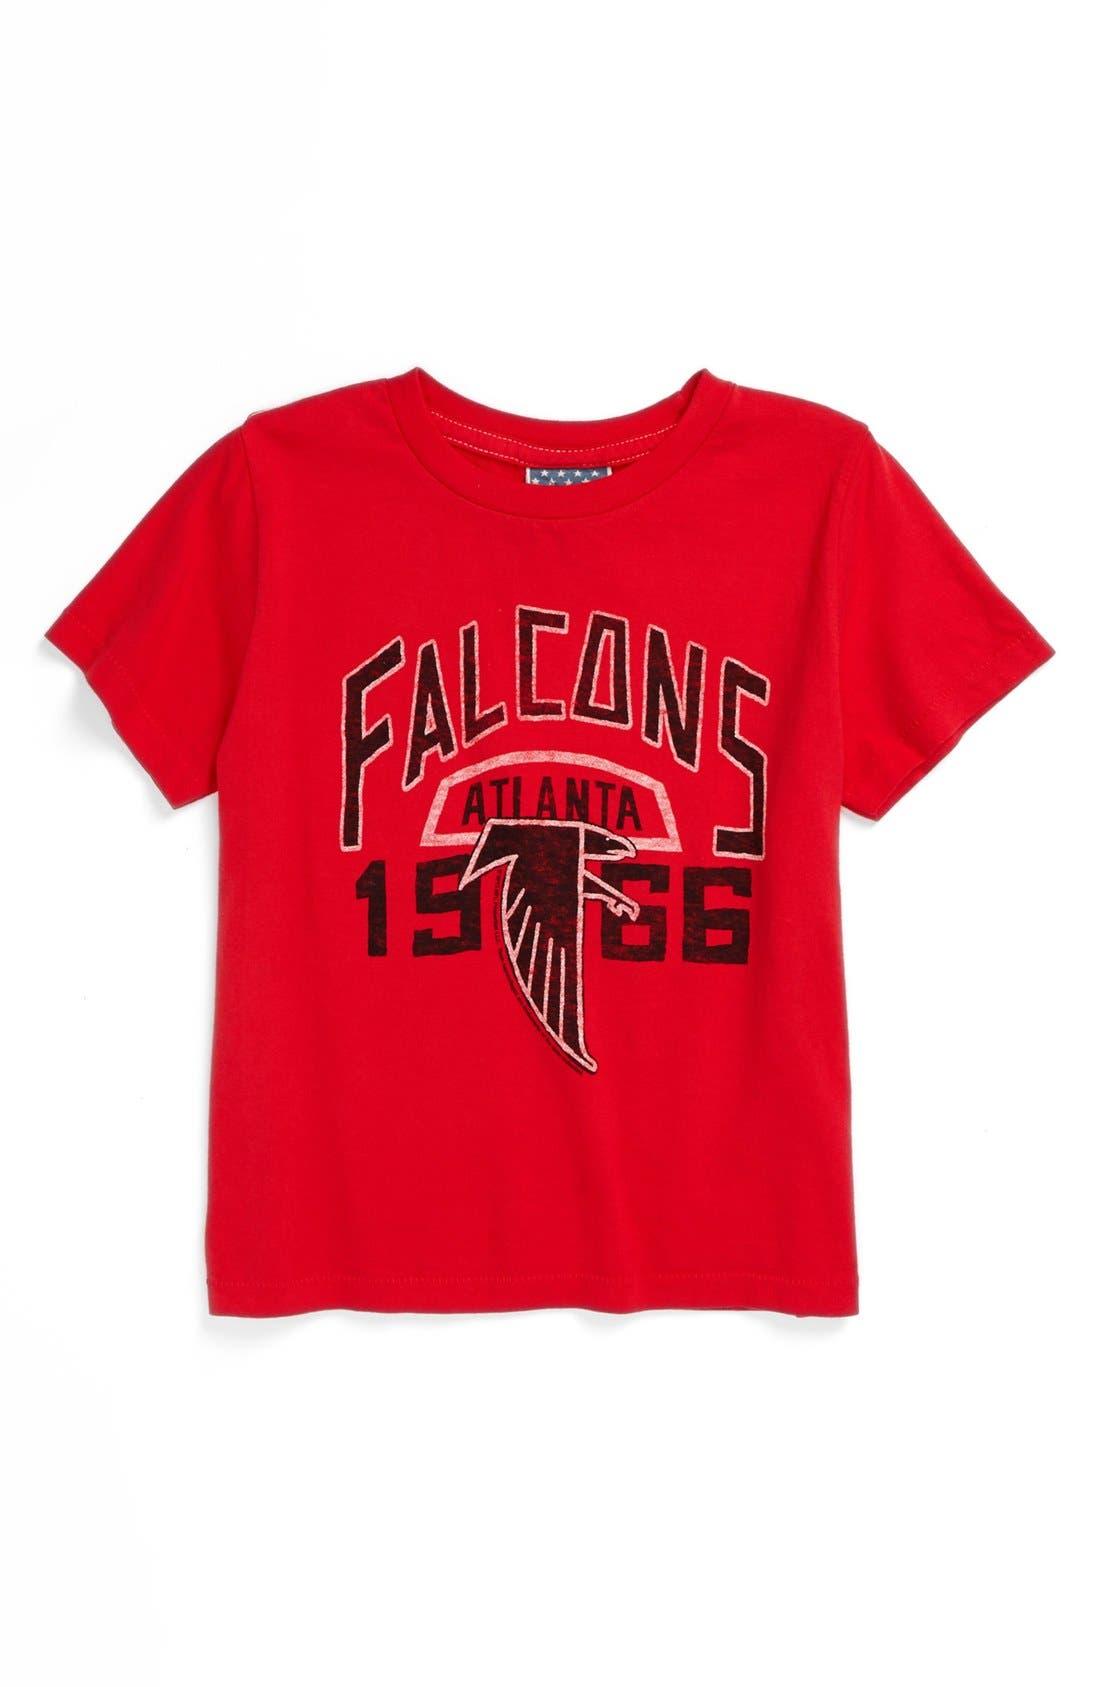 Main Image - Junk Food 'Atlanta Falcons' T-Shirt (Toddler Boys)